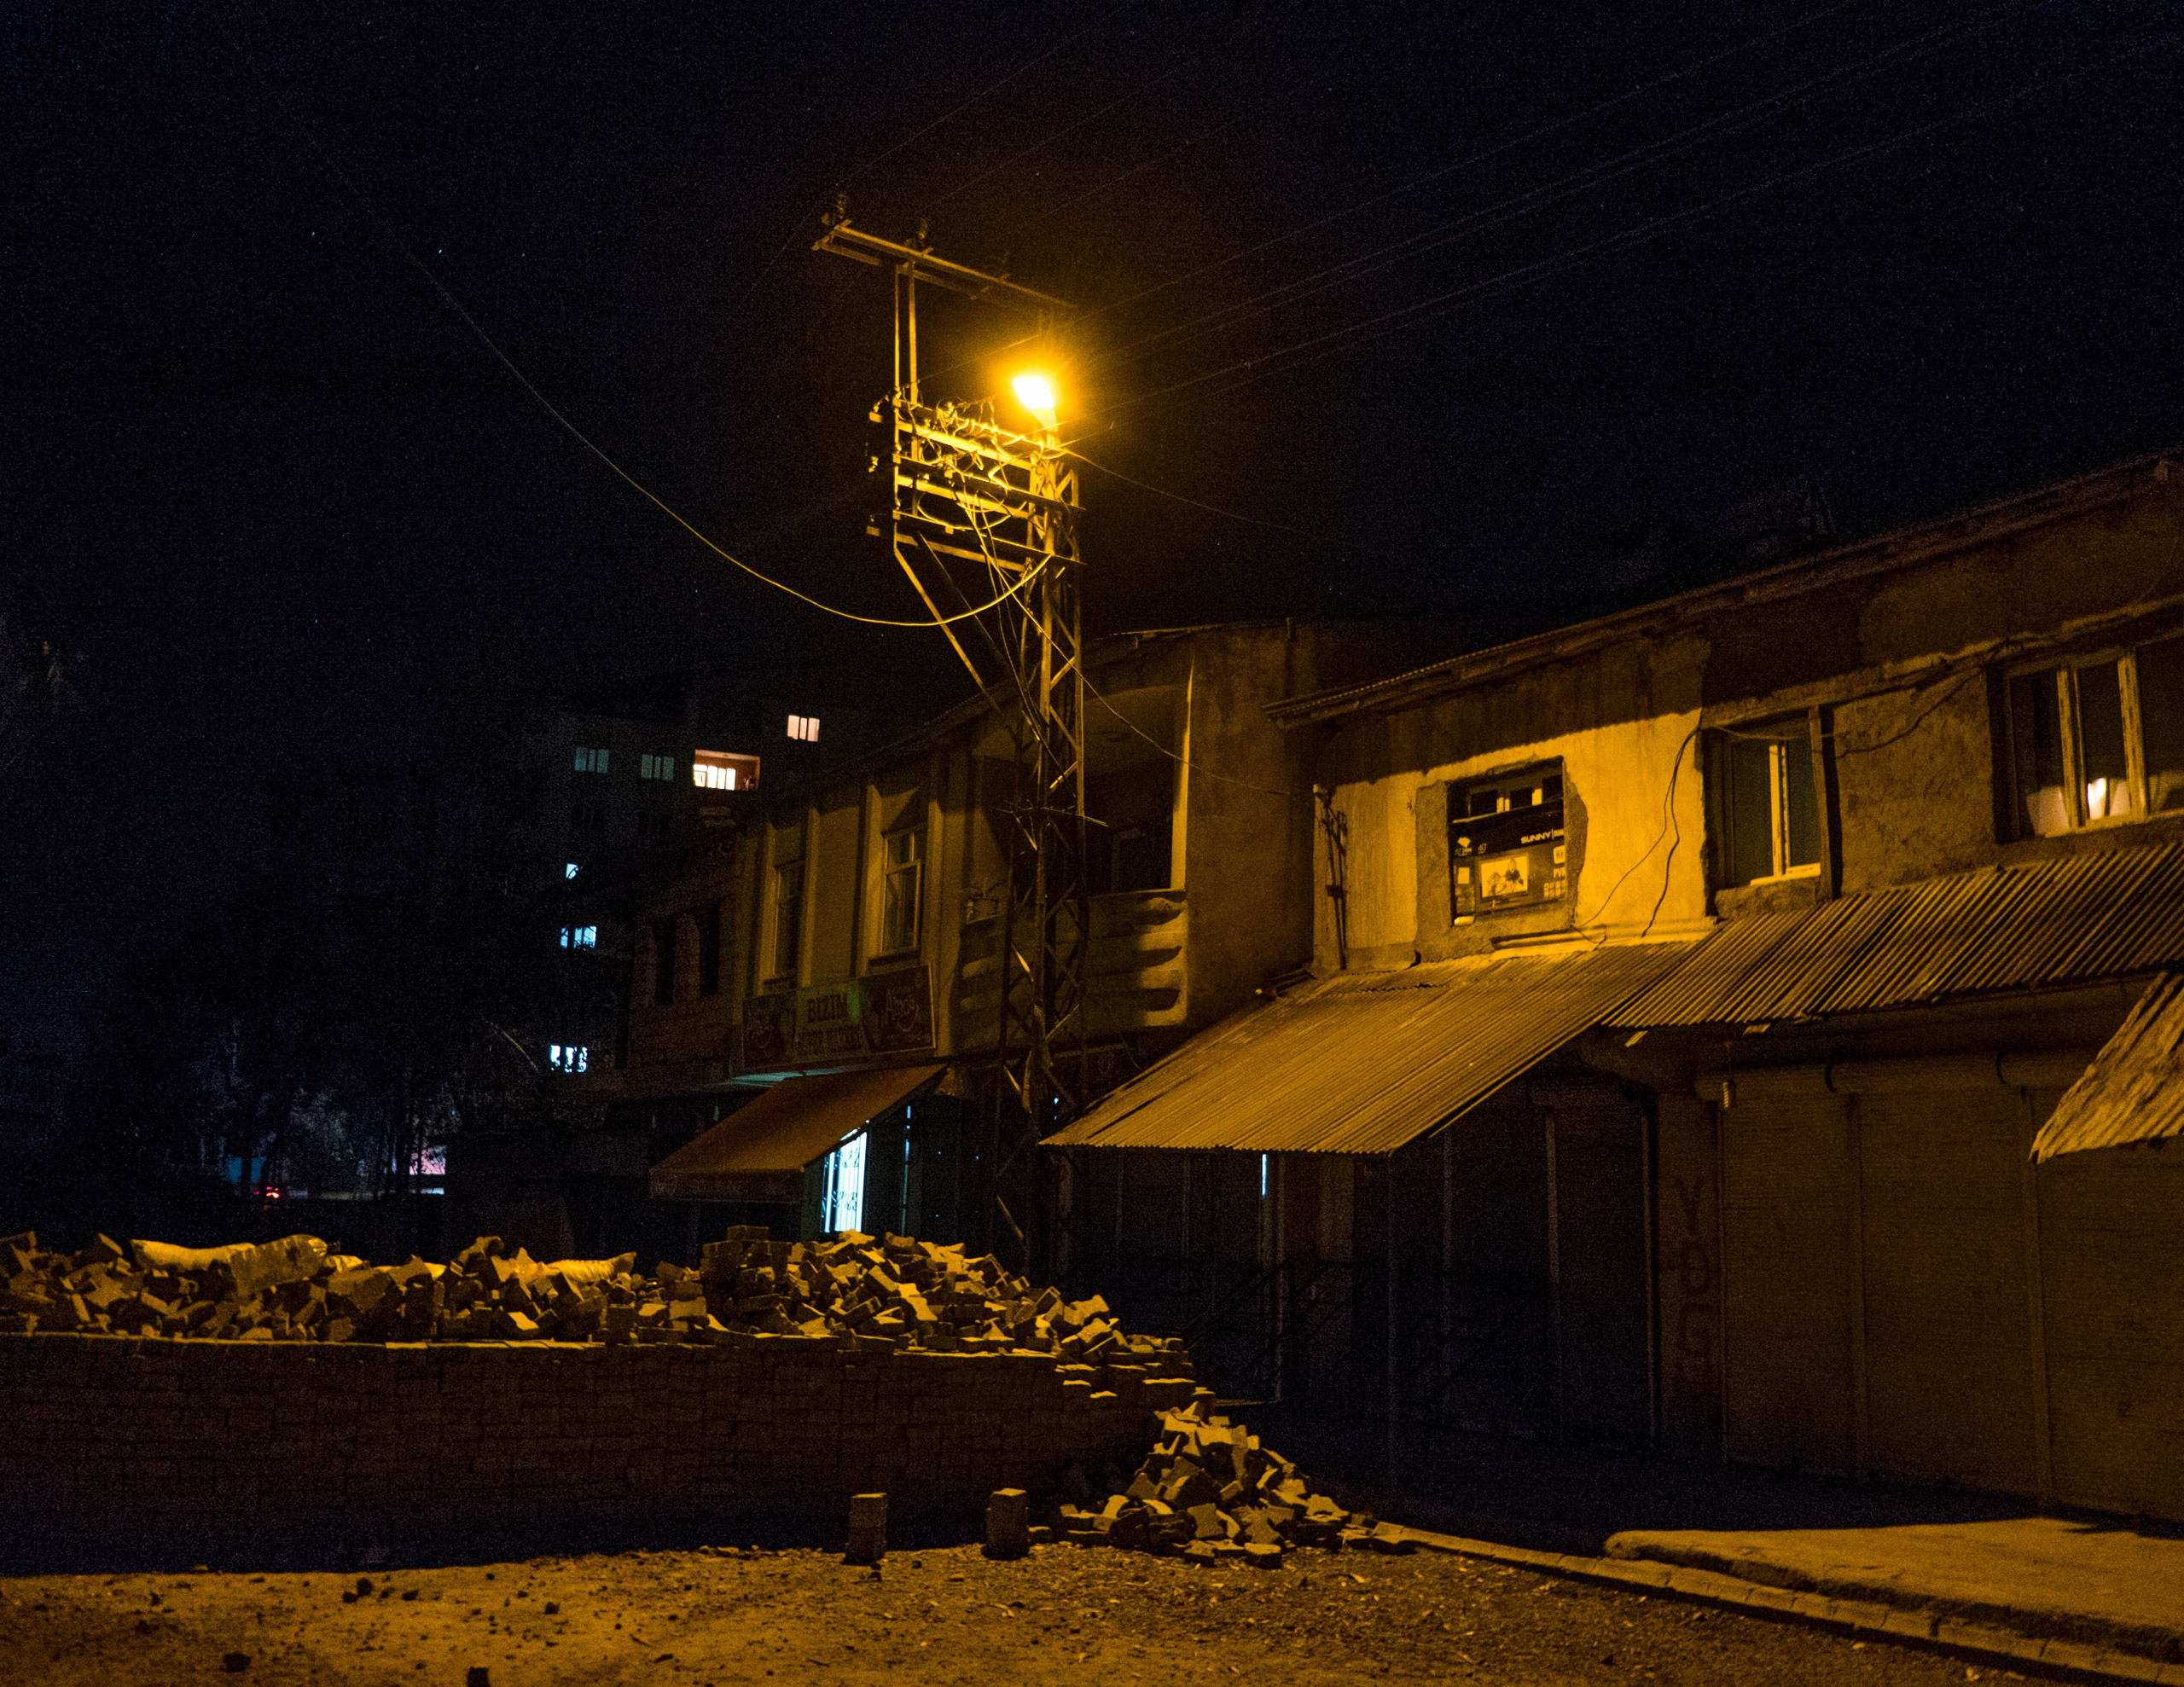 Barricades in Cumhuriyet, a self declared autonomous neighborhood in Yuksekova, Turkey, on Nov. 3, 2015.